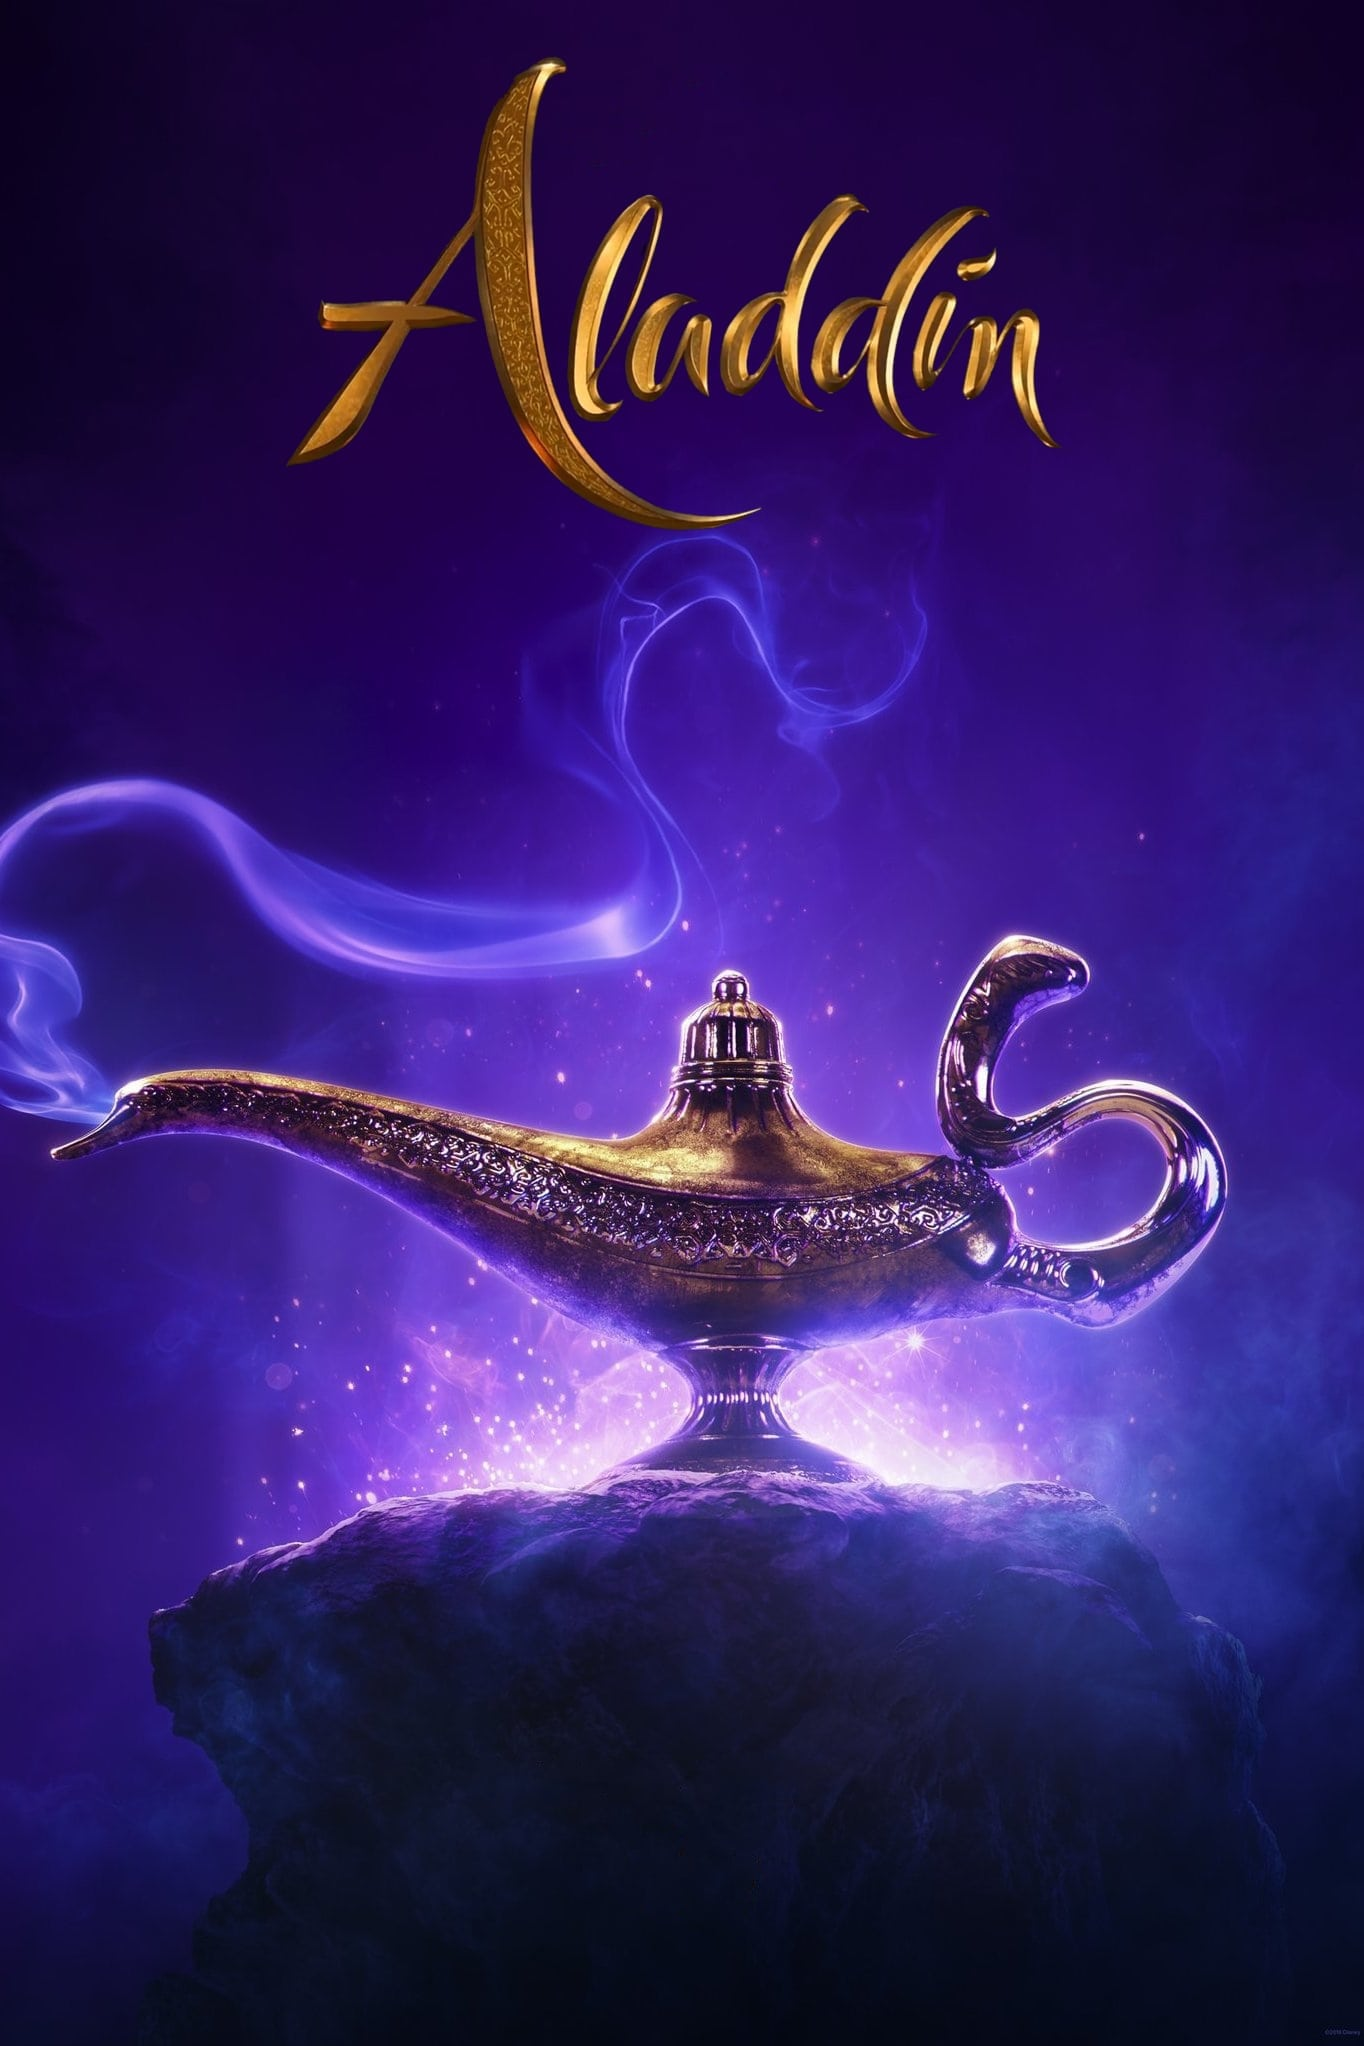 Película: Aladin (2009) | abandomoviez.net